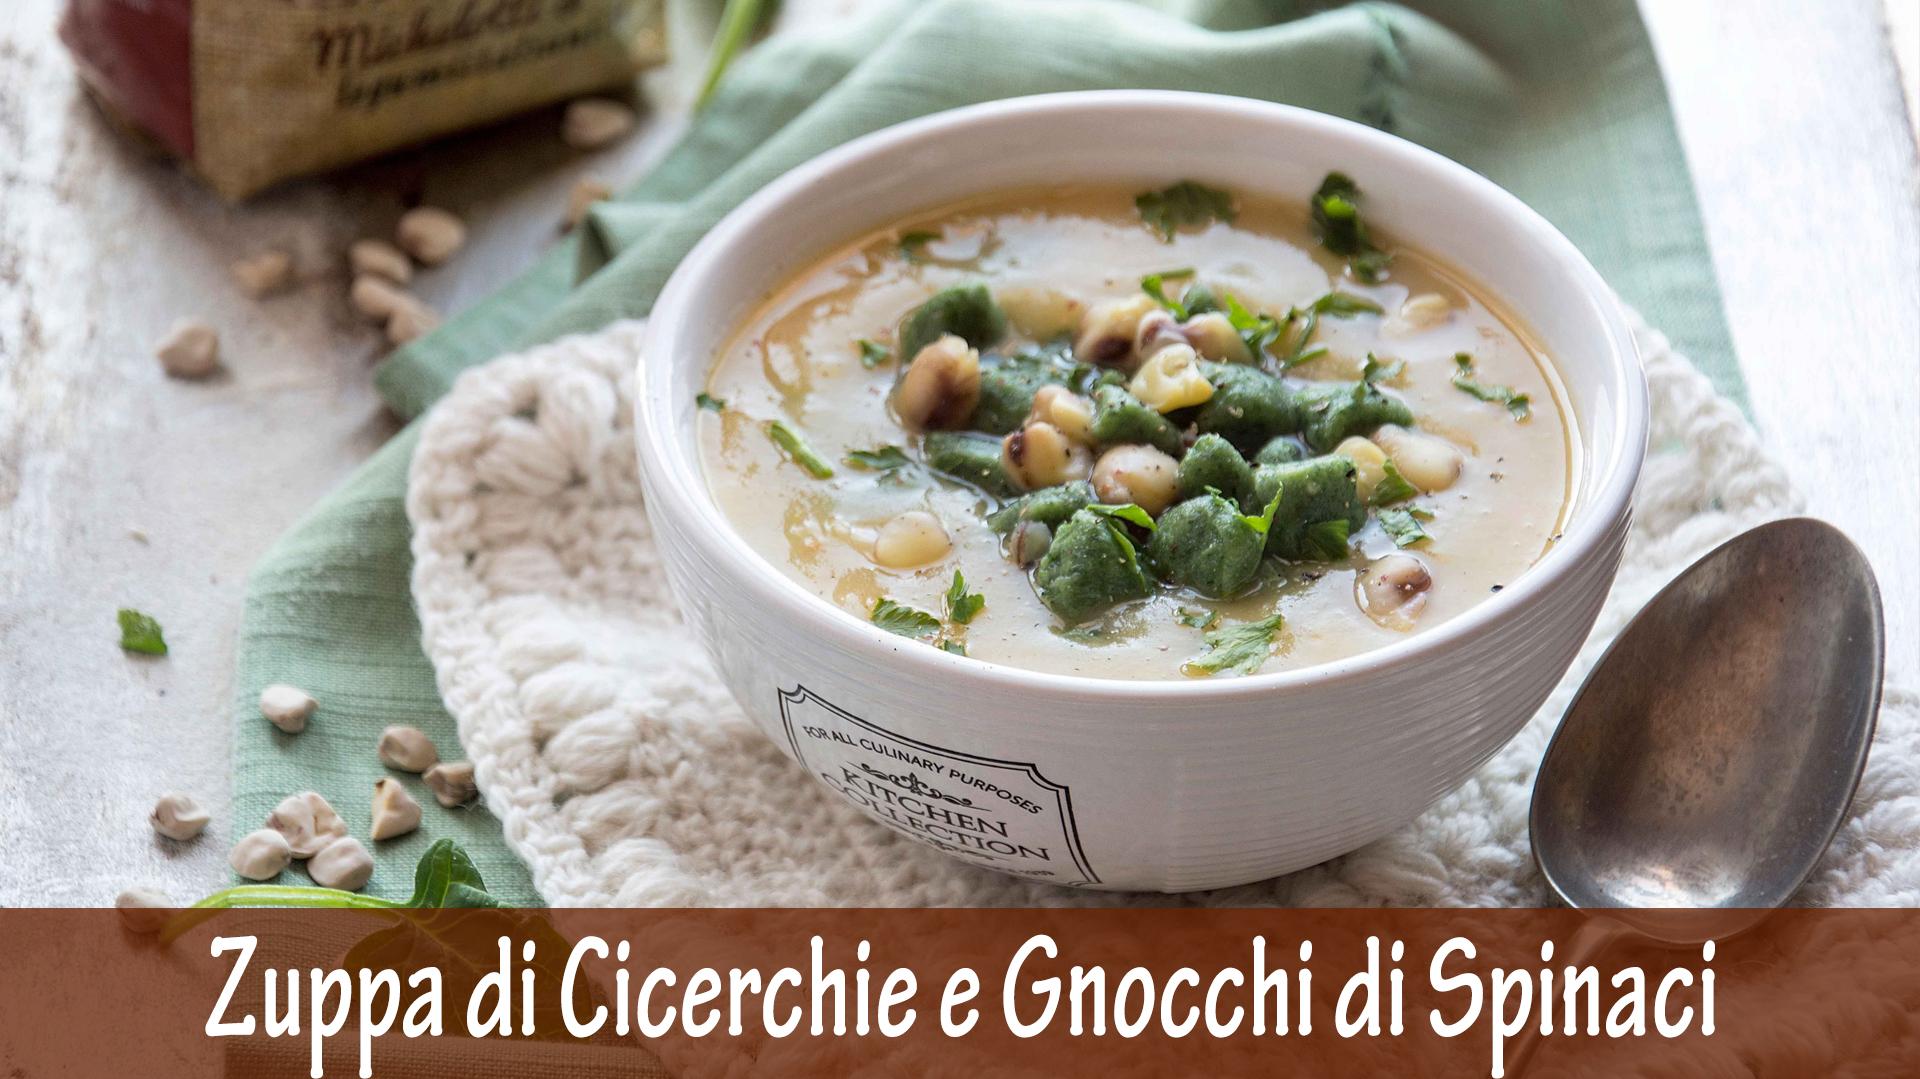 Zuppa di Cicerchie e Gnocchi di spinaci